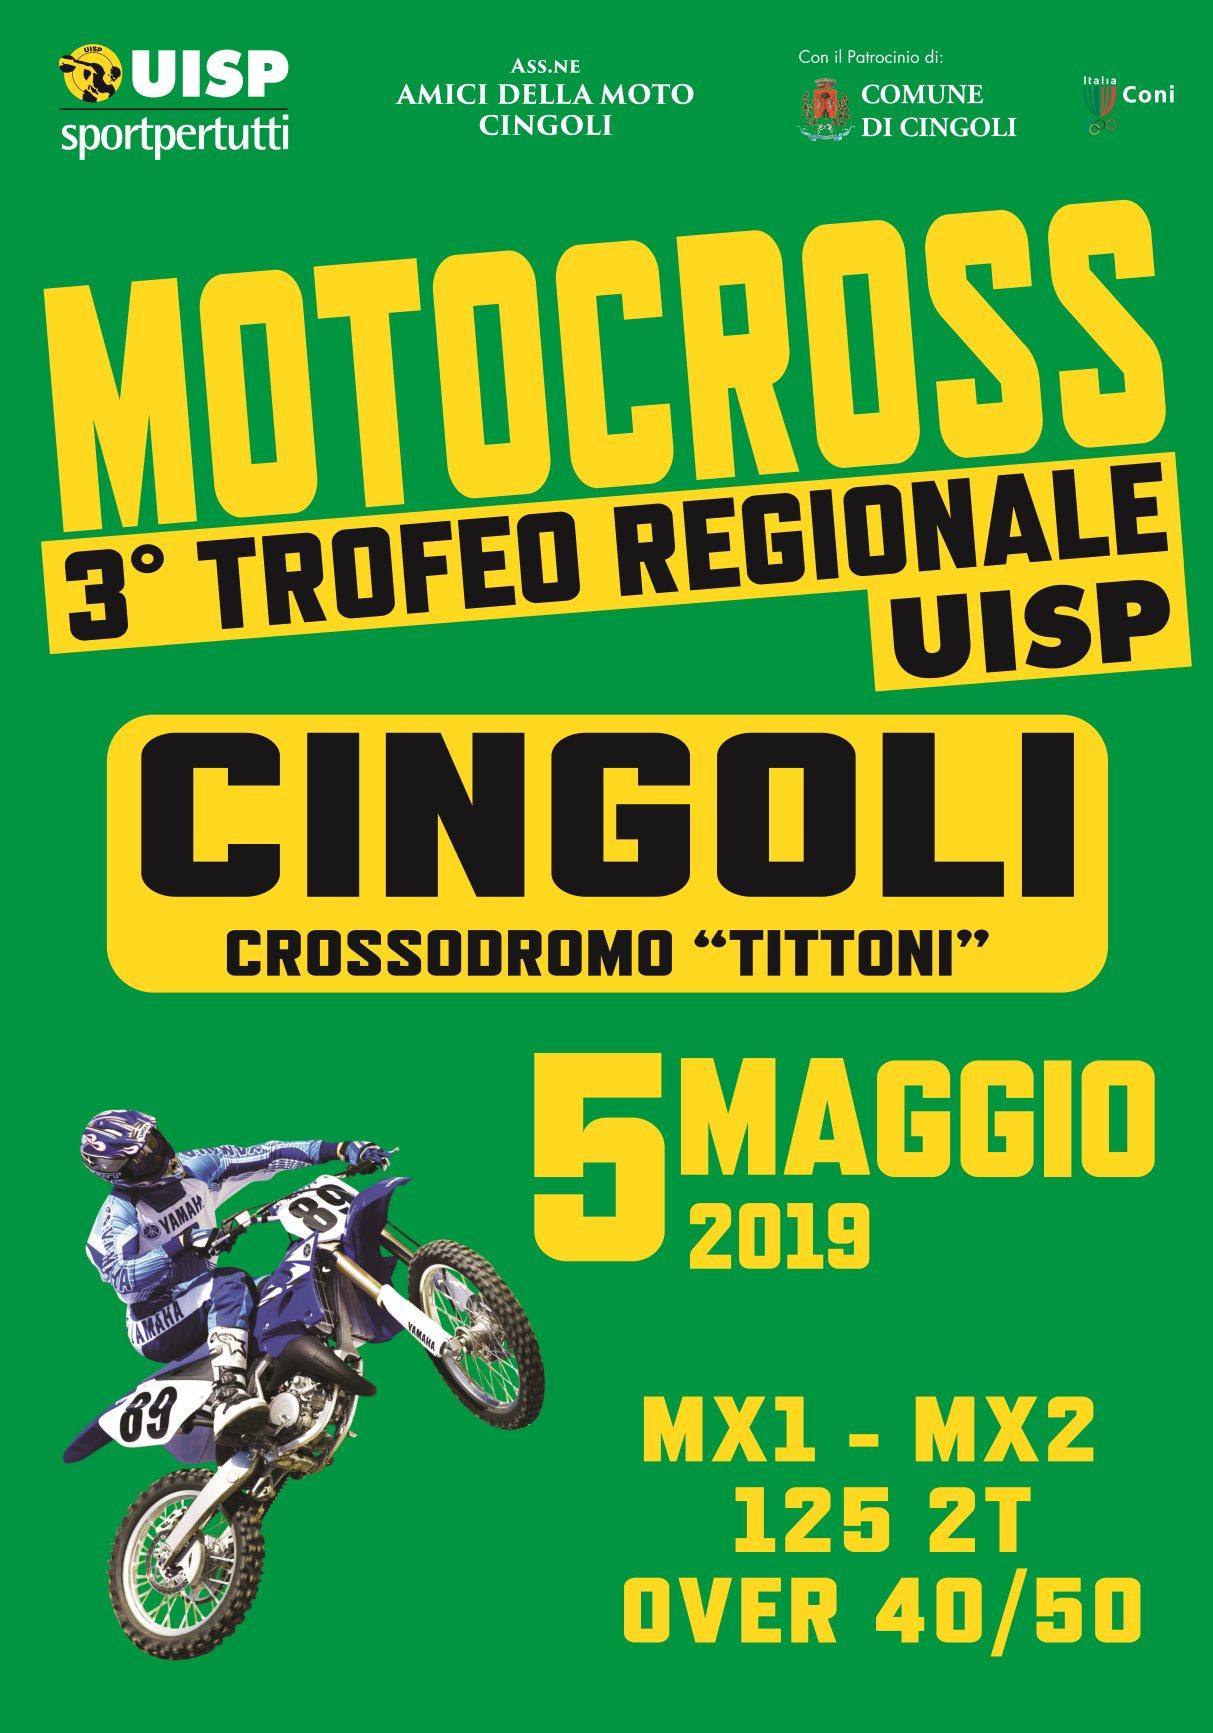 Calendario Mondiale Motocross.Moto Club A Fagioli Cingoli